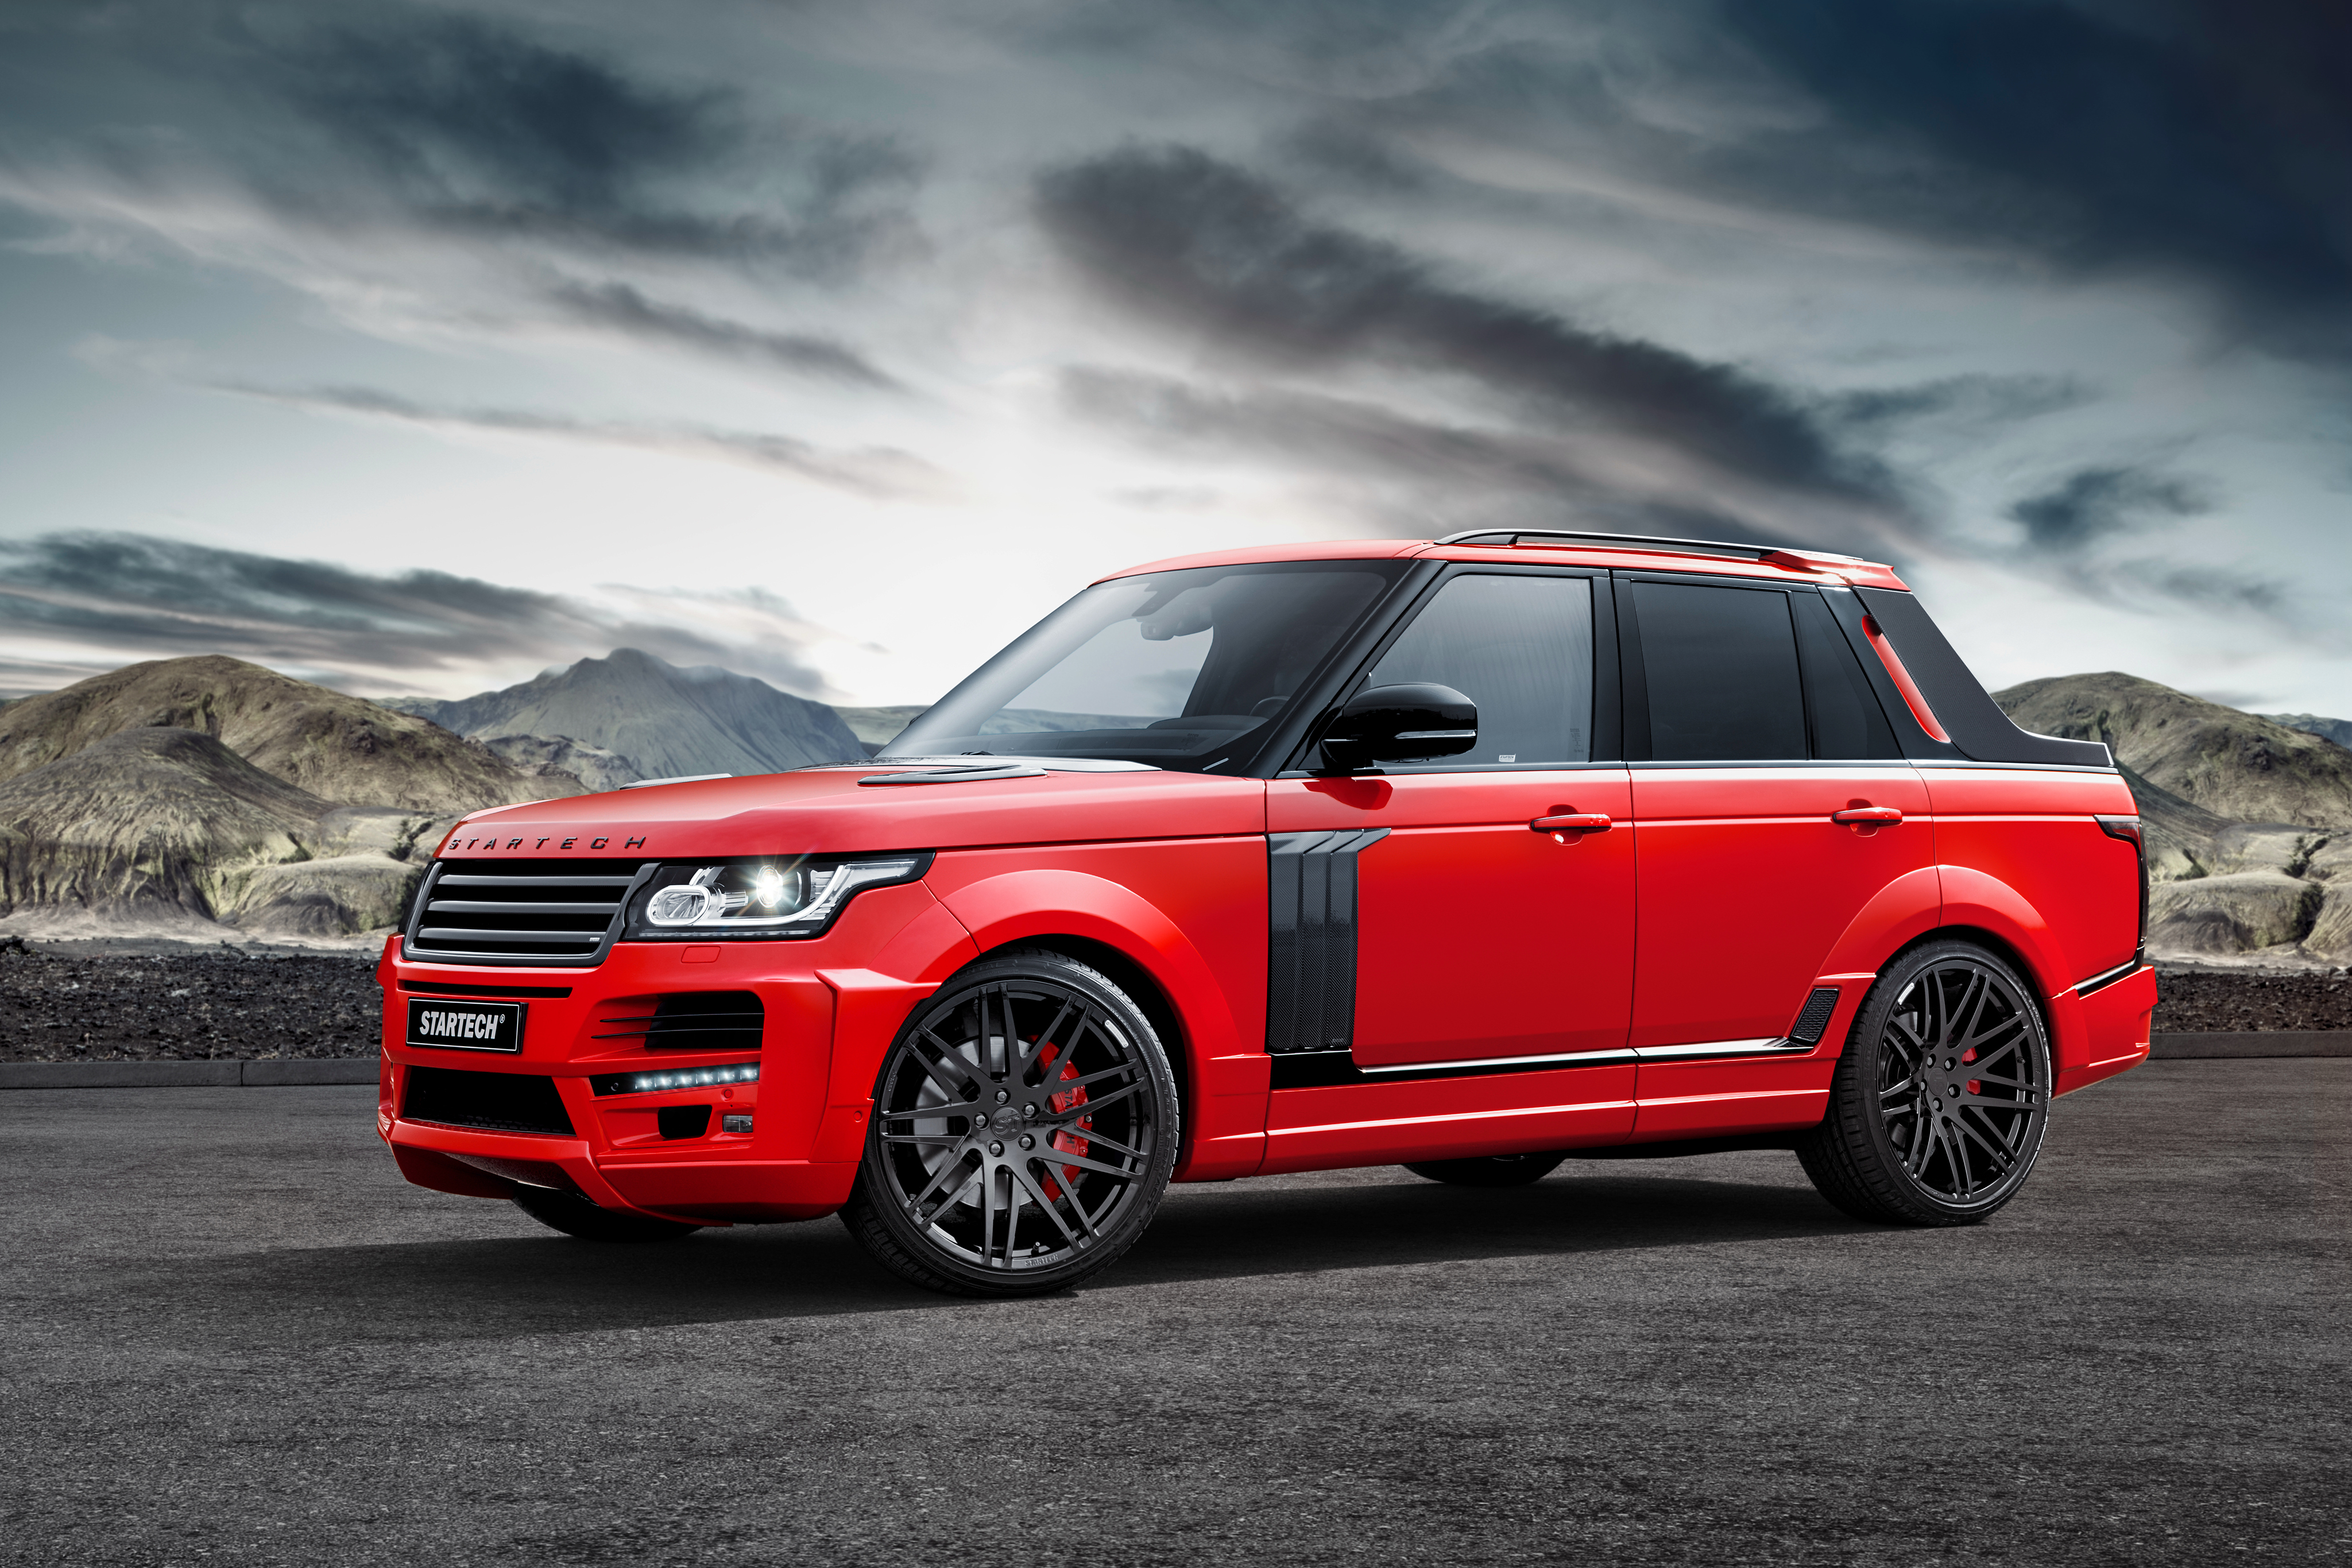 Startech Range Rover Pick-Up